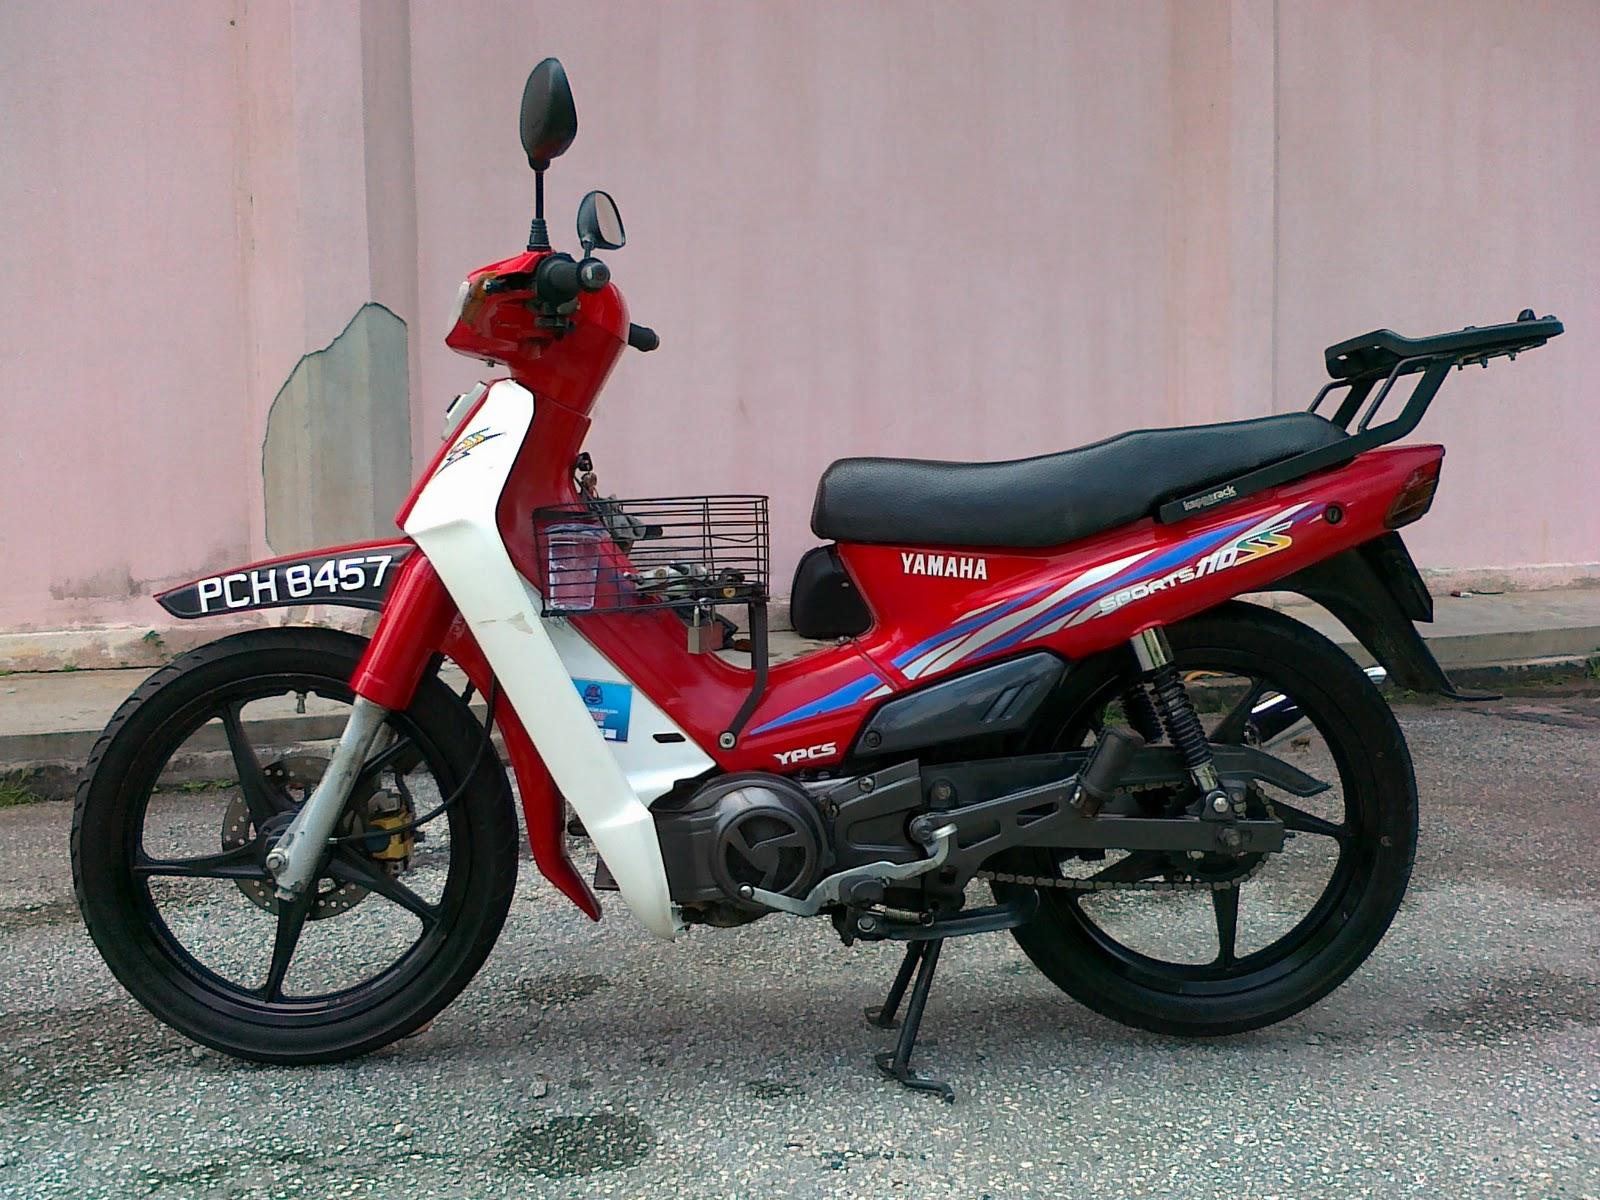 Download Kumpulan 97 Gambar Motor Yamaha Ss110 Terunik Motorindo69